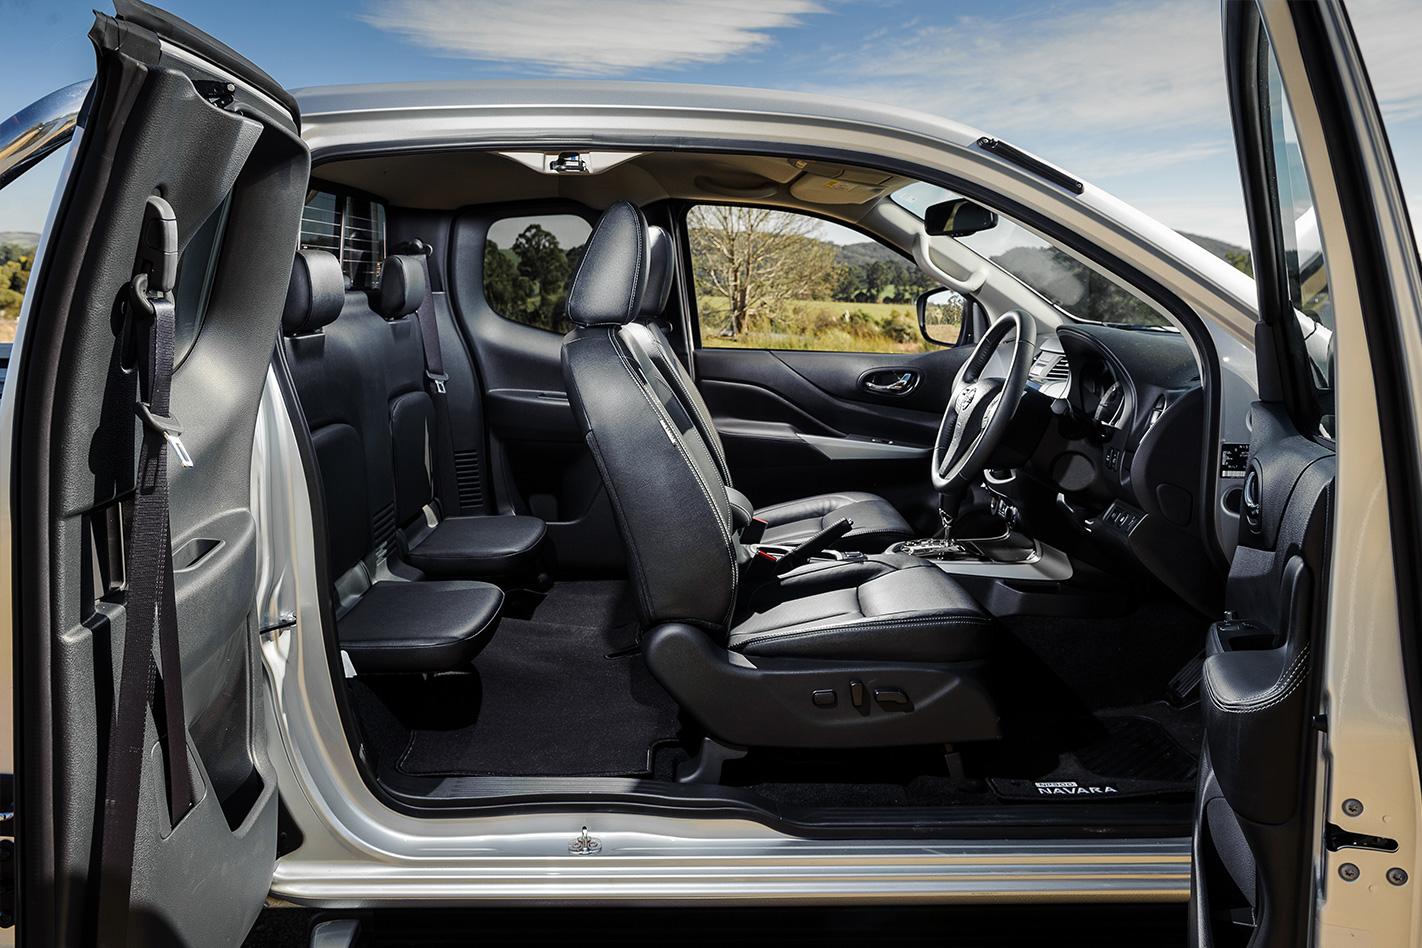 2017 Nissan Navara dual cab v king cab v single cab review ...